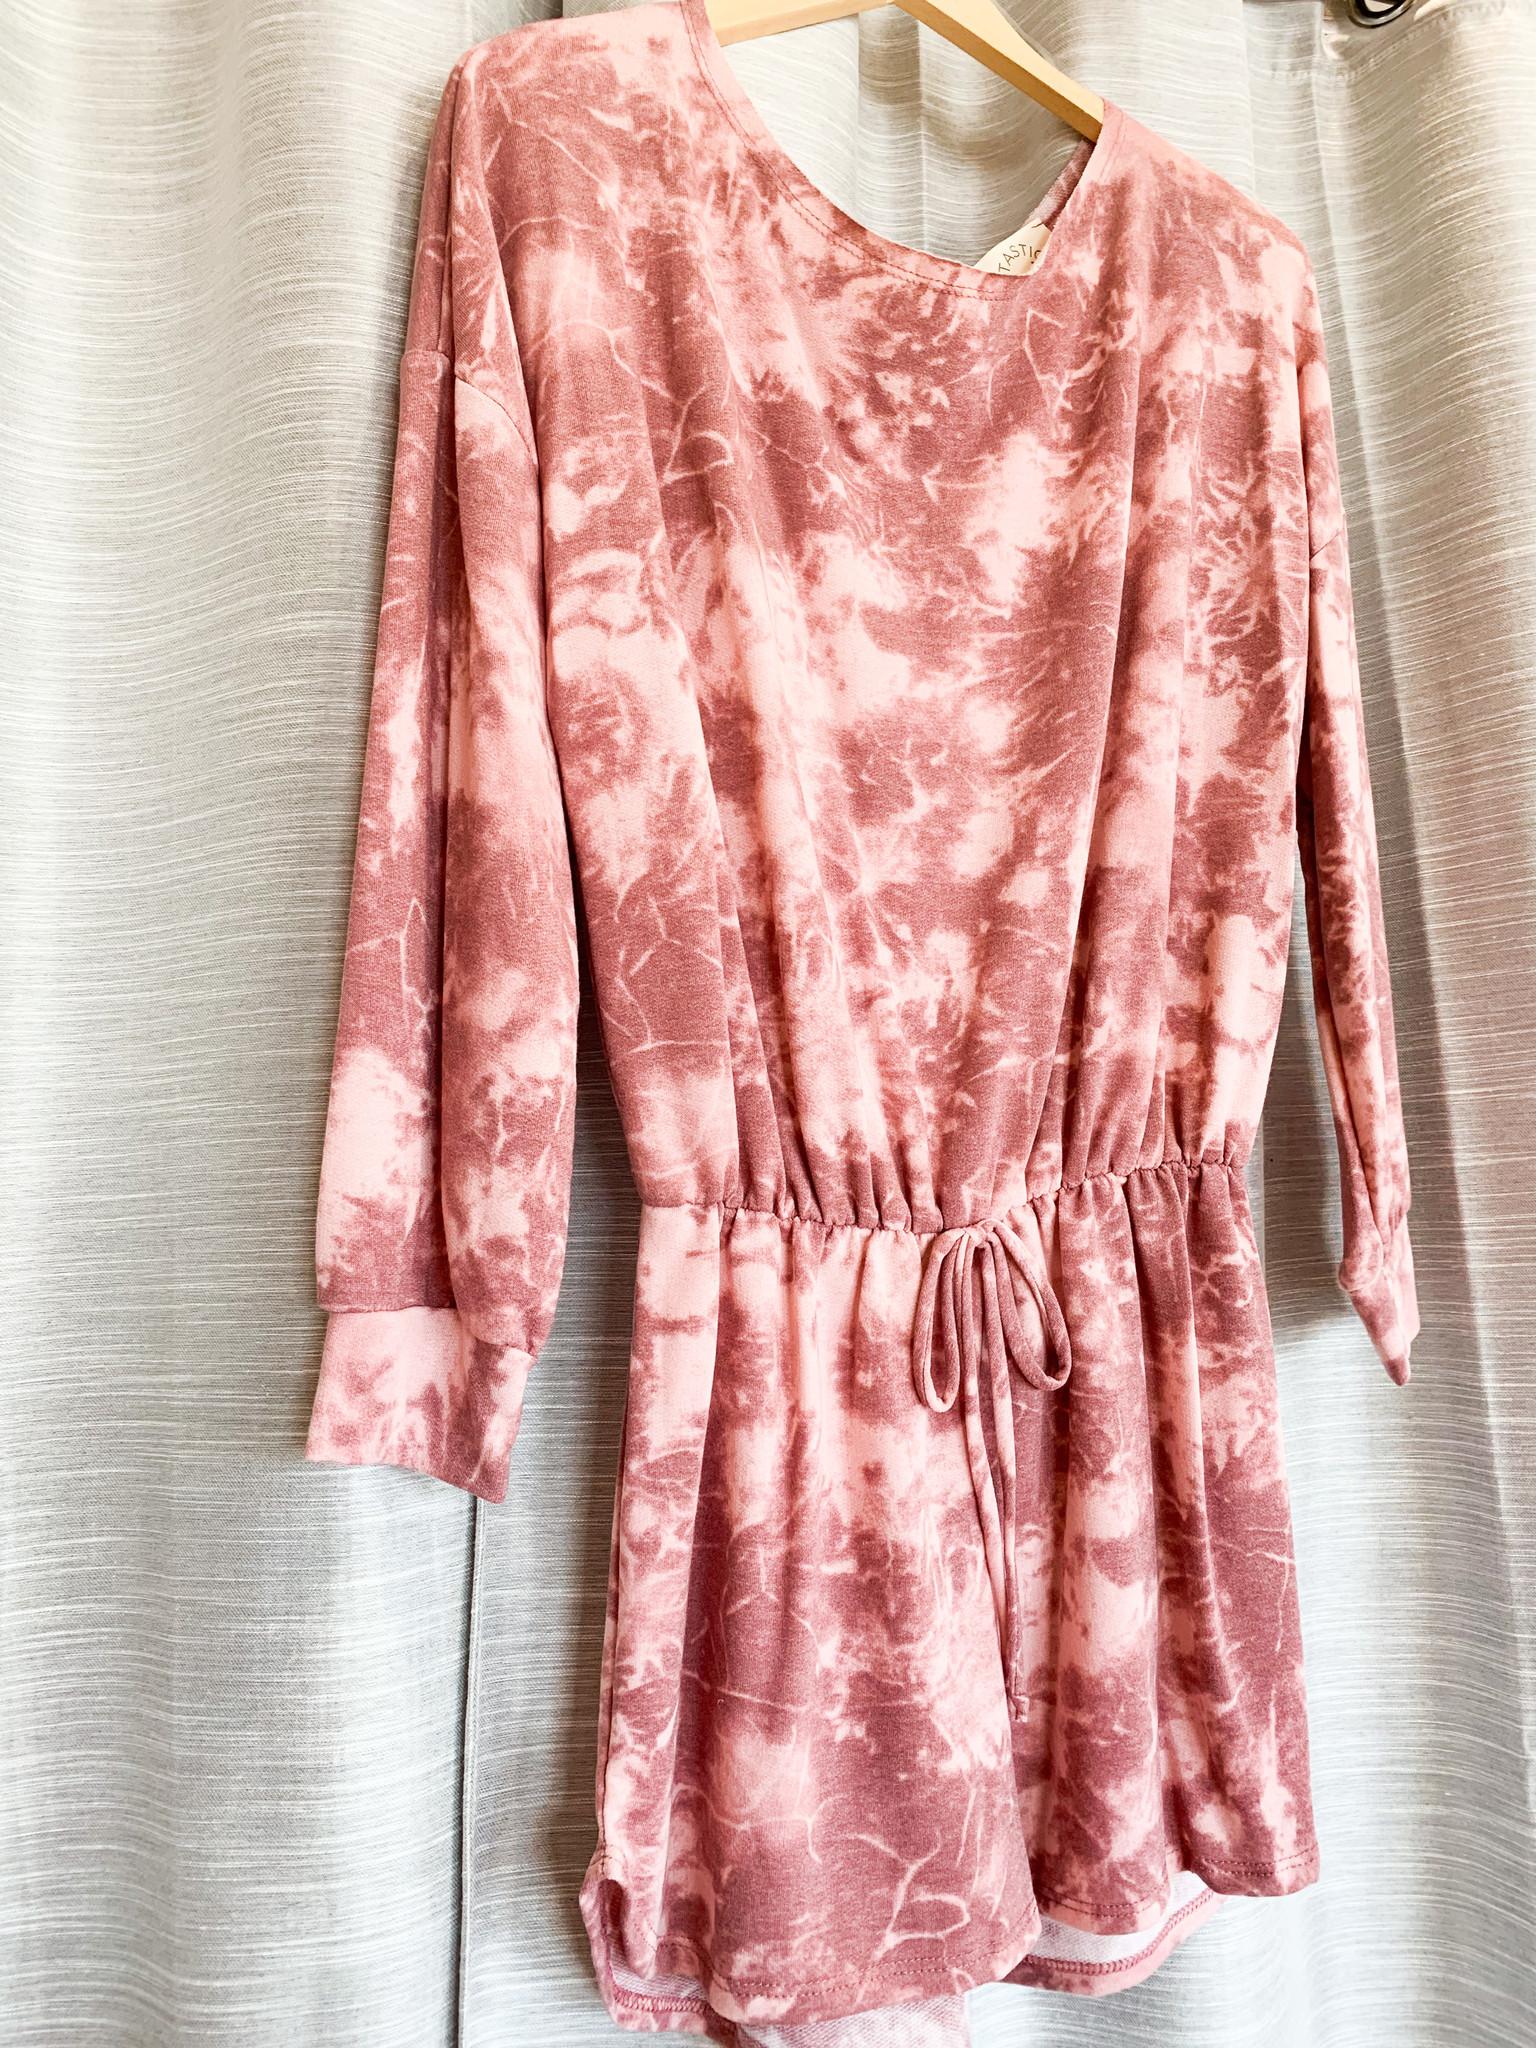 Mauve/Burgundy Tie Dye Knit Romper